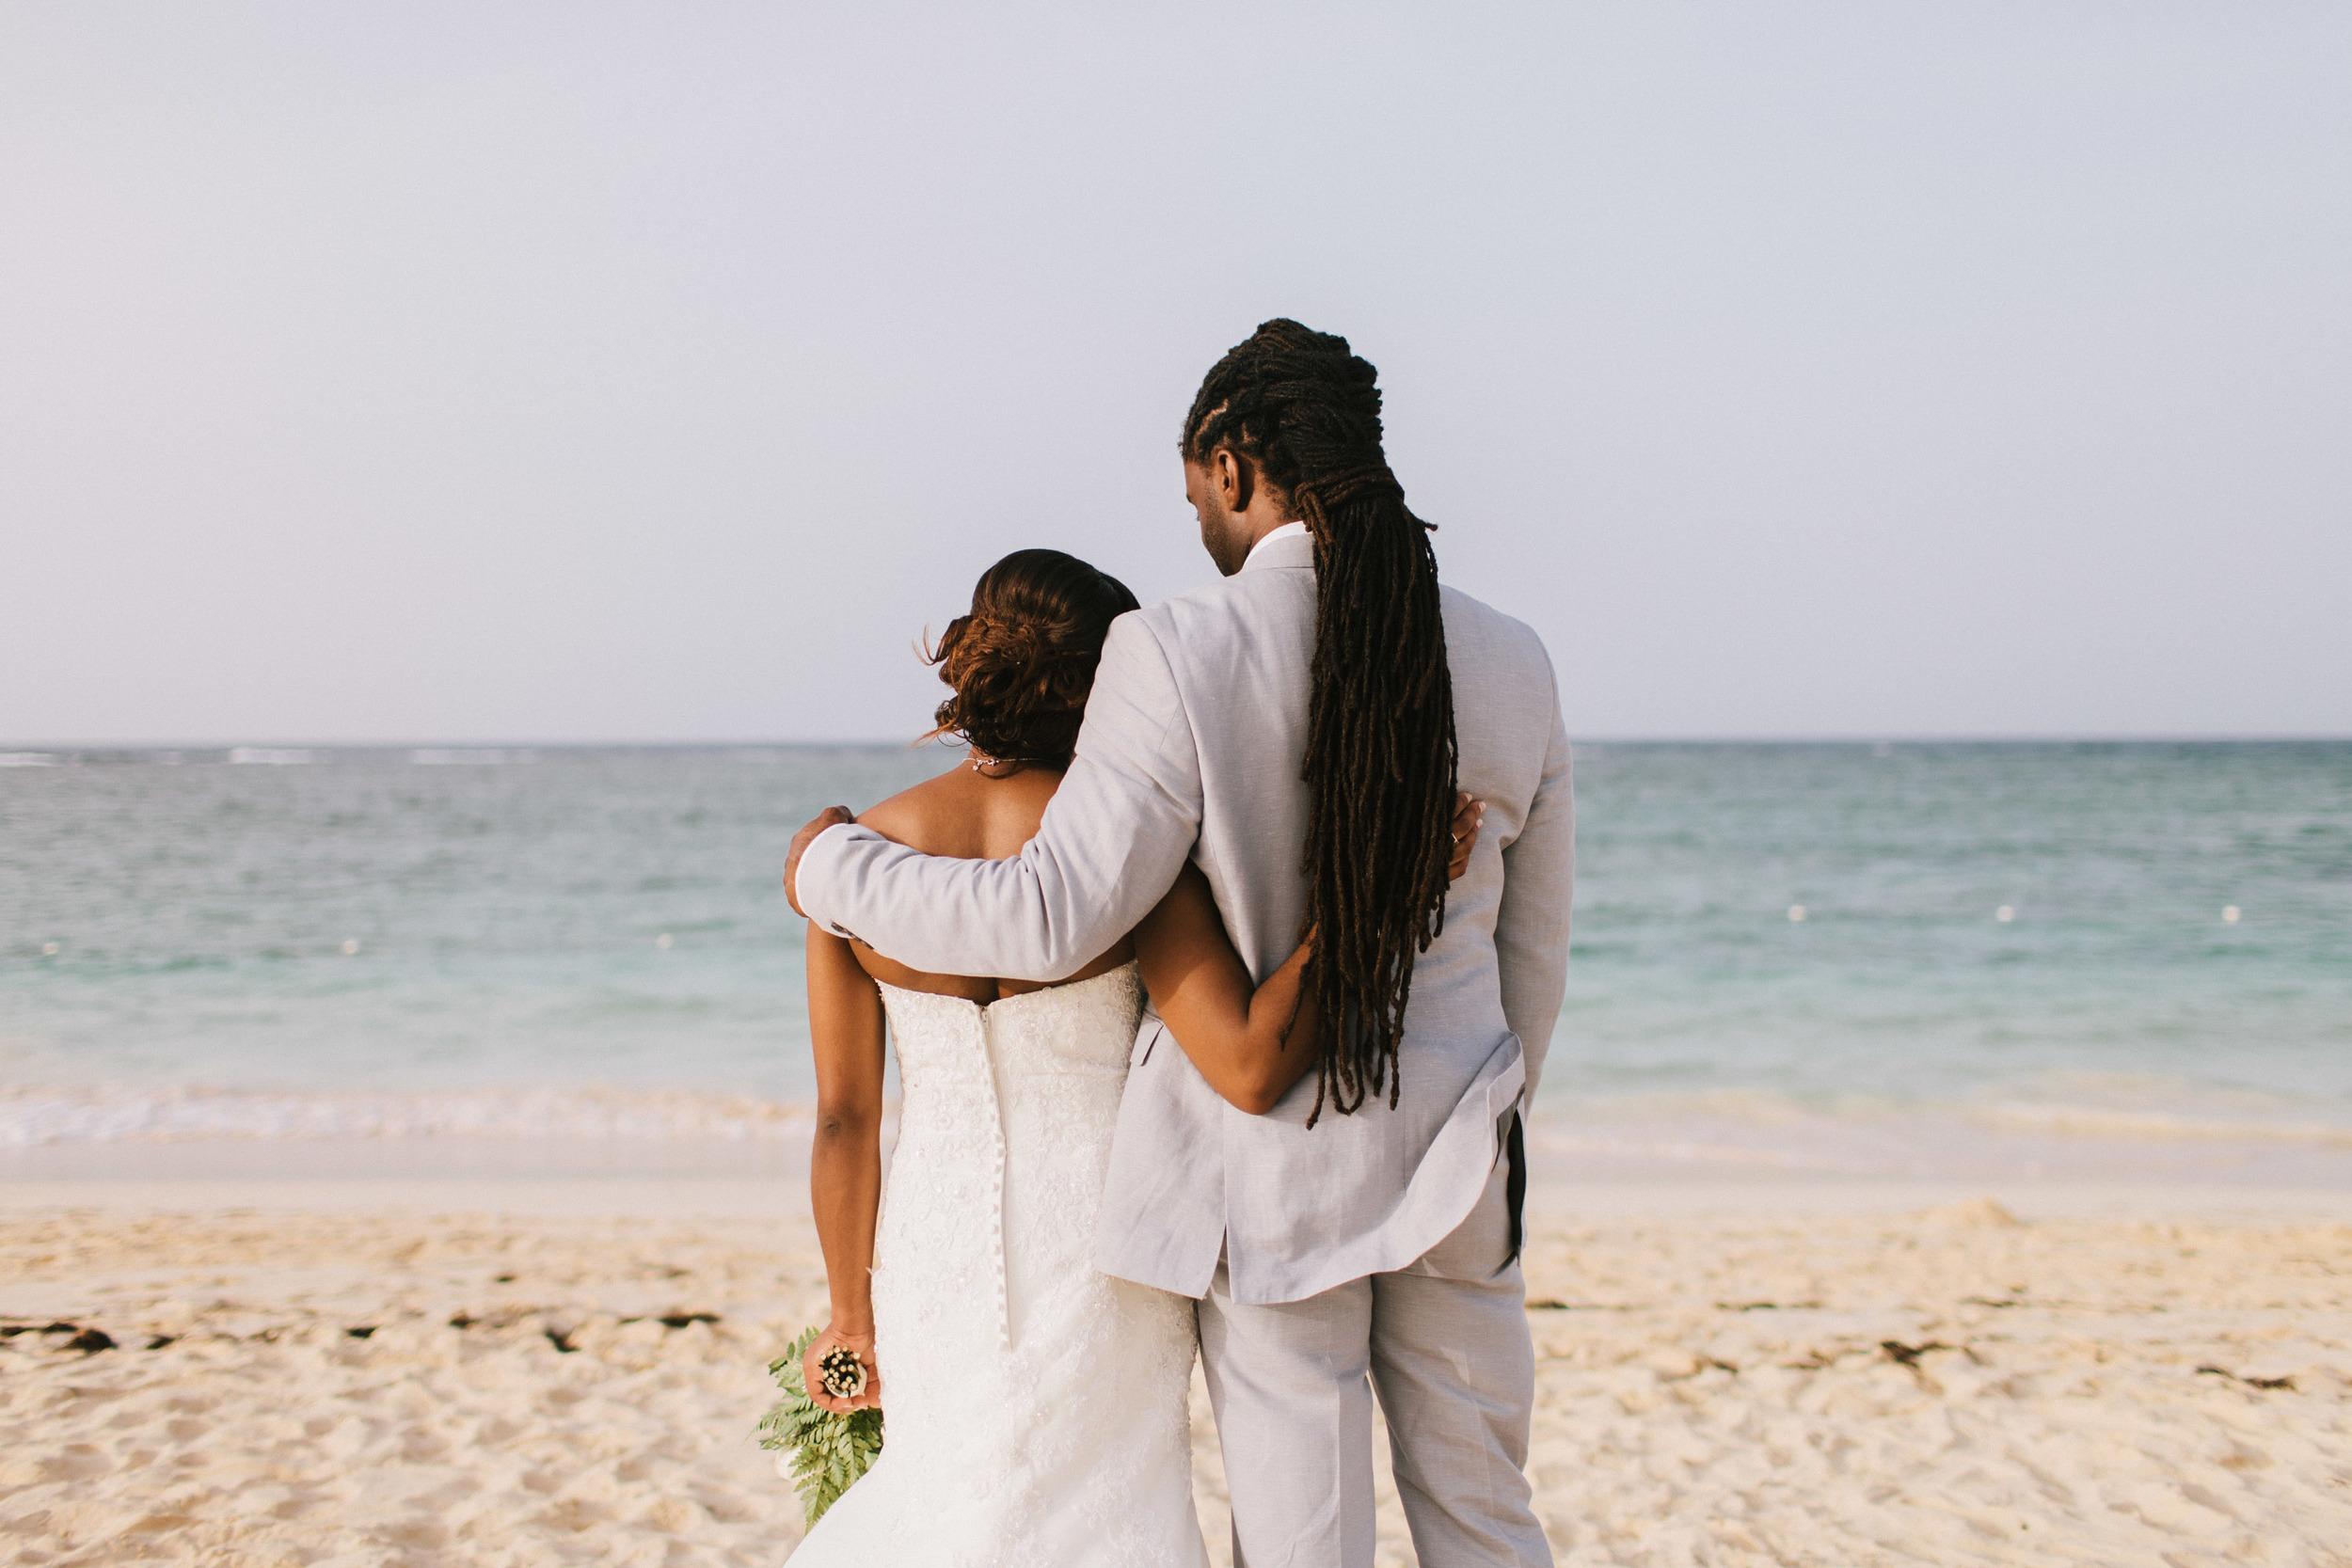 michael-rousseau-photography-dominican-republic-destination-wedding-cara-jason-colonial-majestic-dominican-republic106.jpg